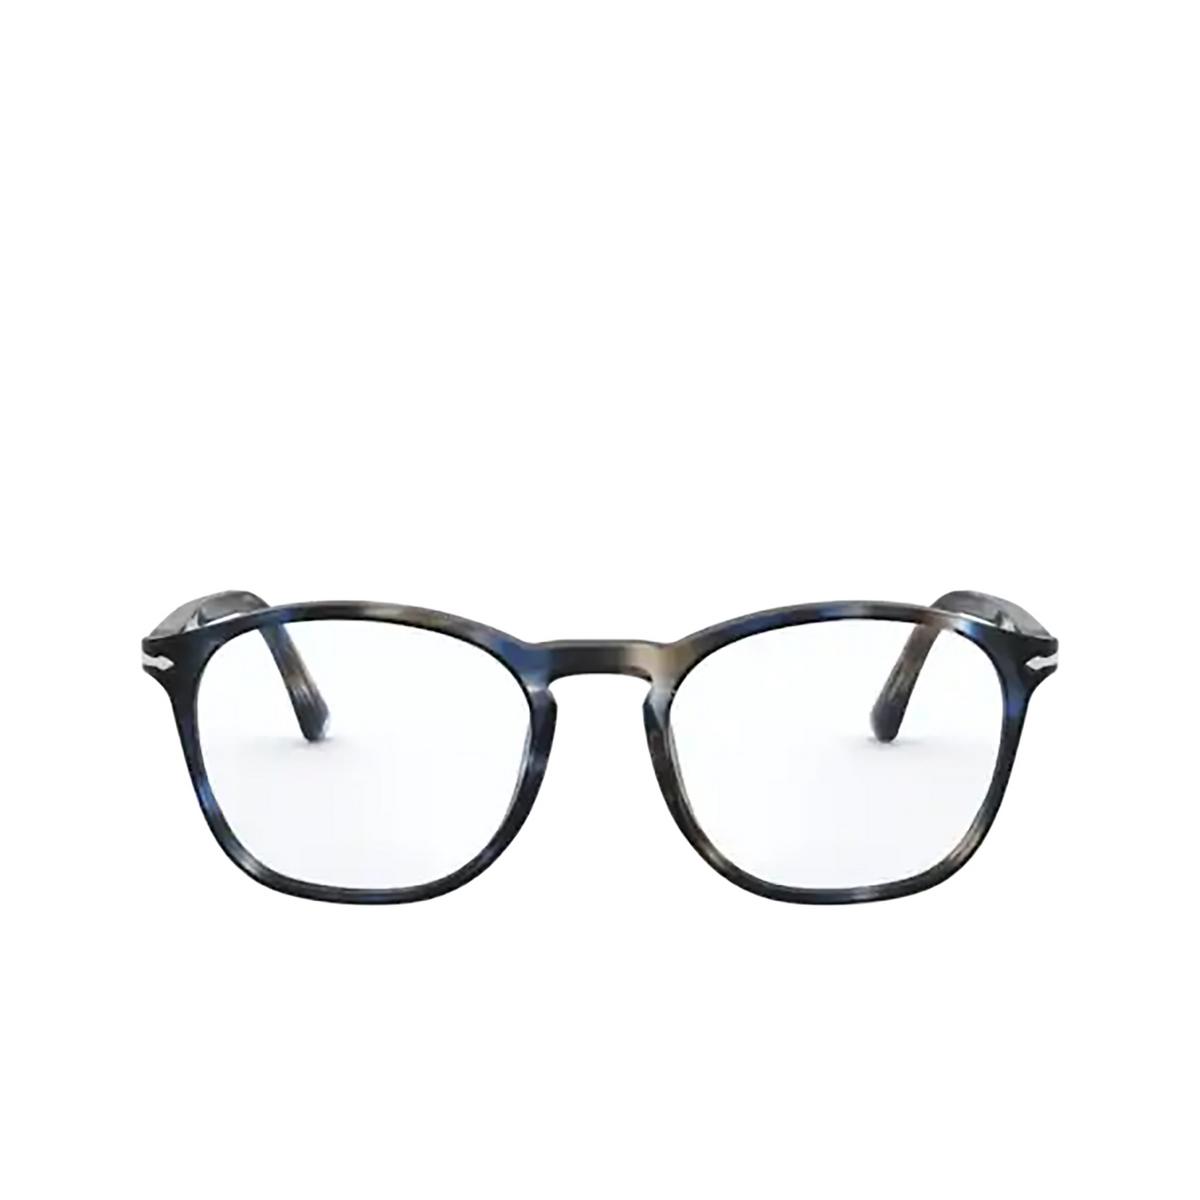 Persol® Square Eyeglasses: PO3007VM color Striped Blue & Grey 1126 - front view.